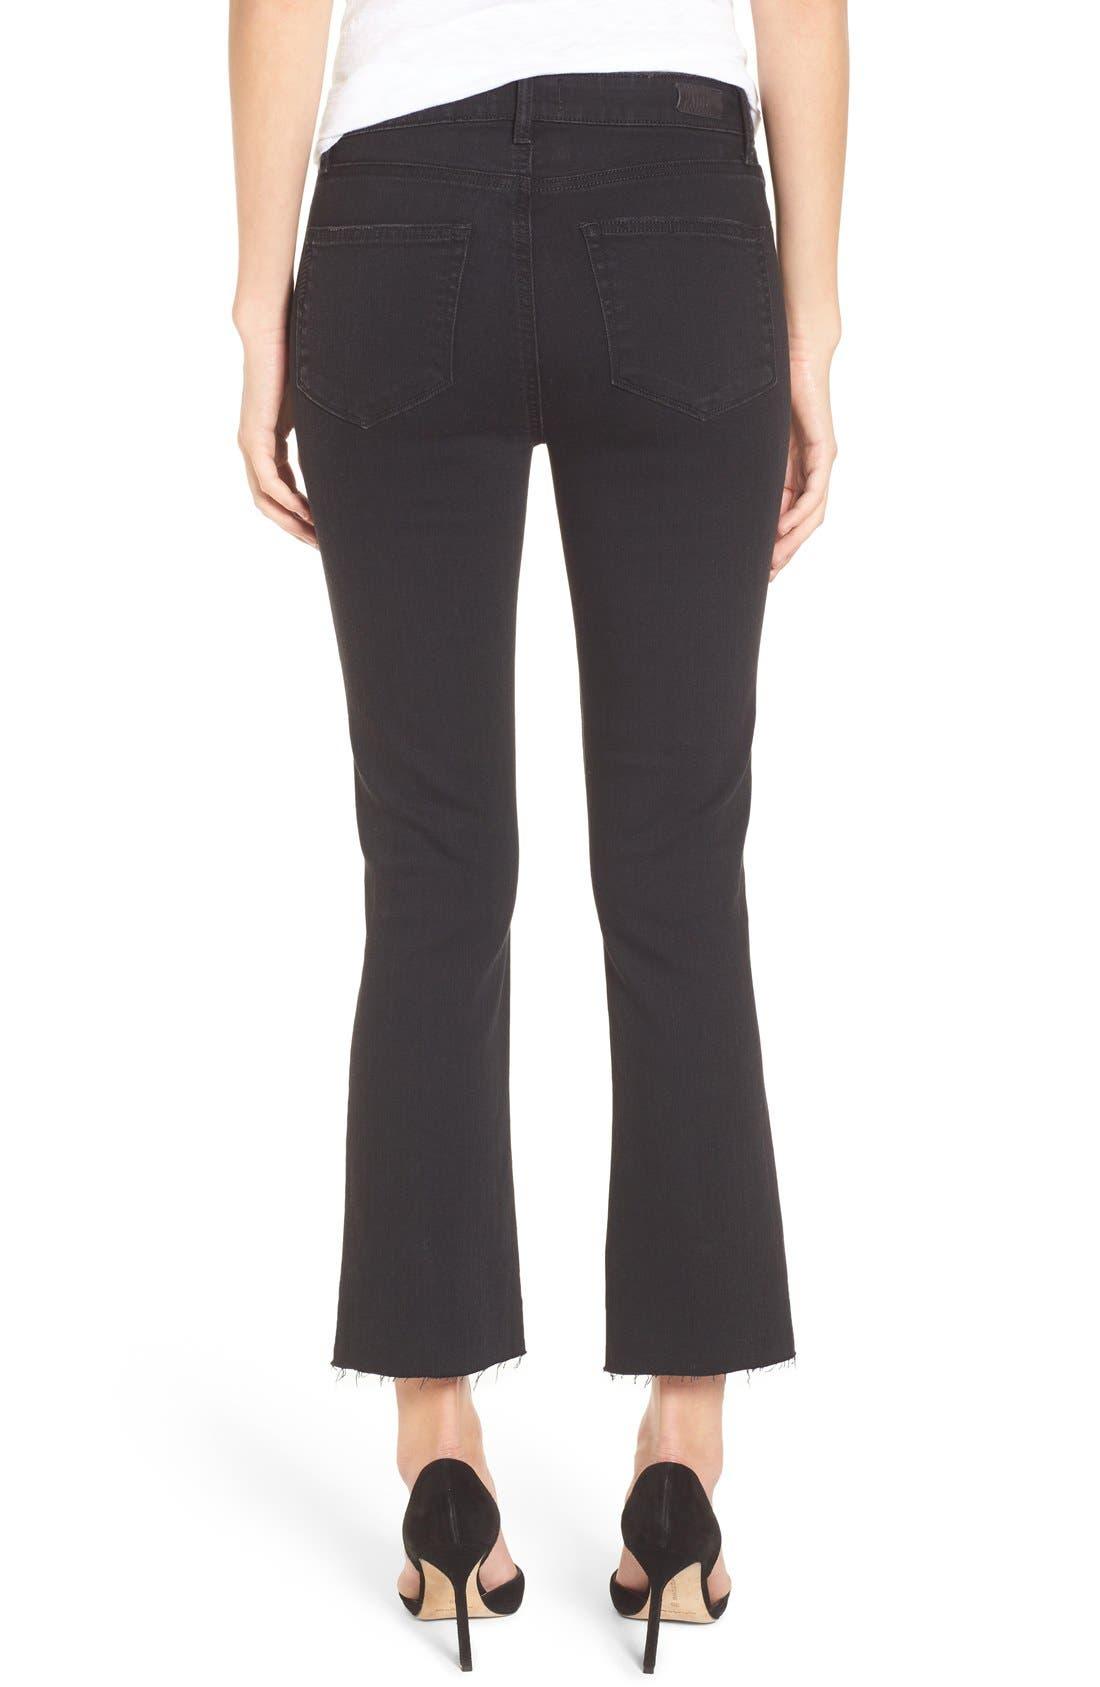 Colette High Waist Raw Hem Crop Flare Jeans,                             Alternate thumbnail 2, color,                             001